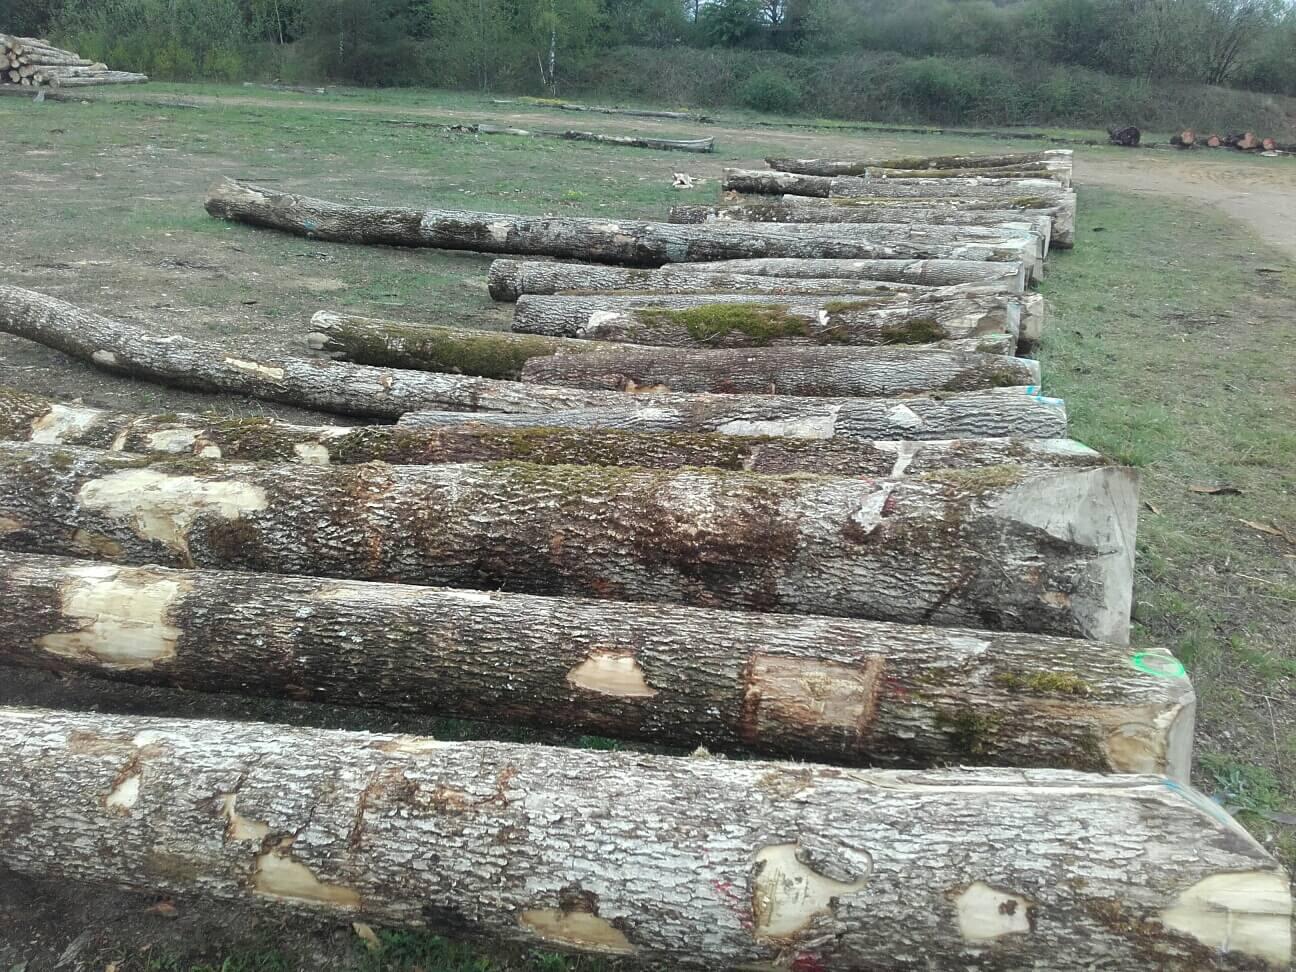 Parc à grumes Arlon, Habay, stockage